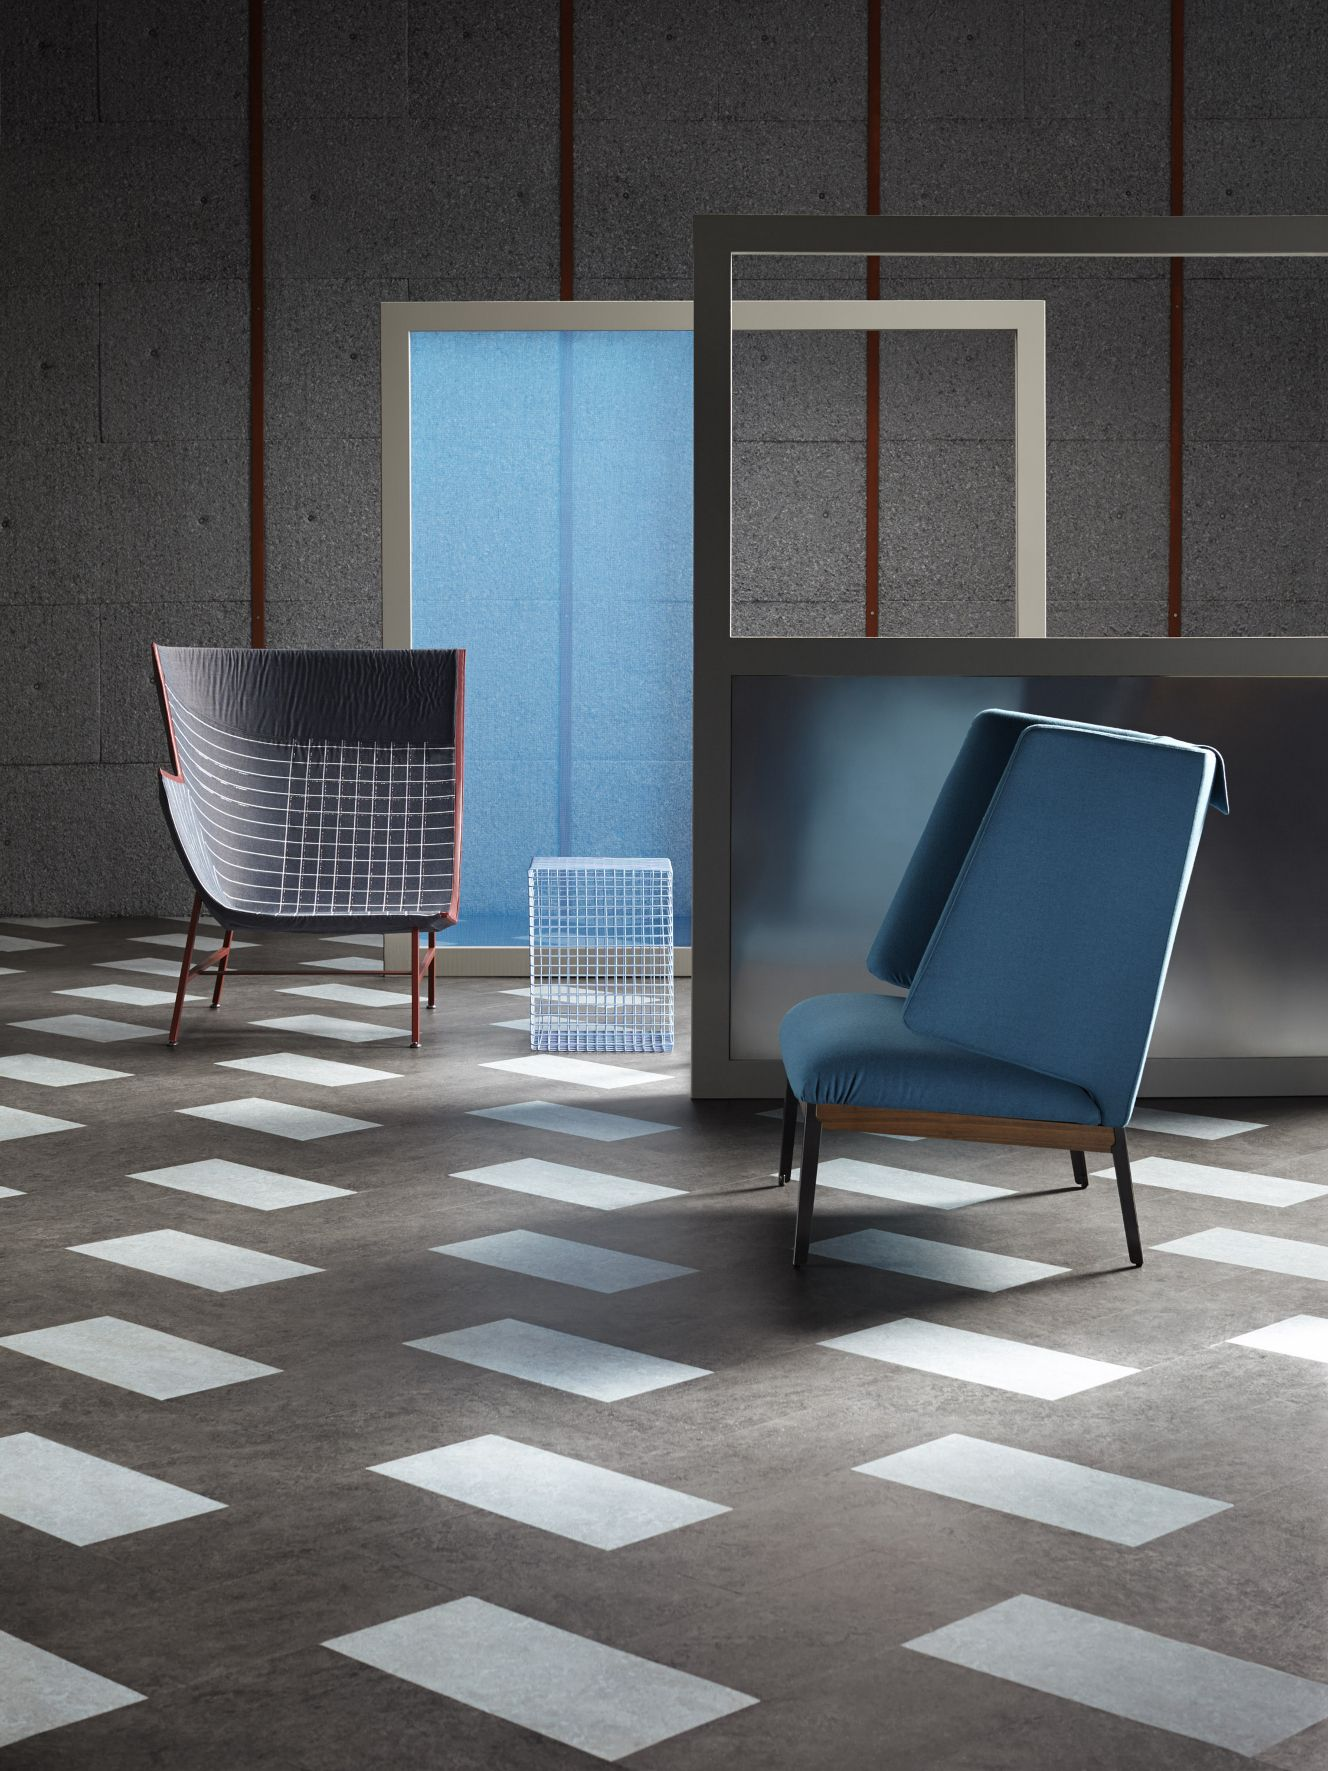 Introducing marmoleum modular a naturally sustainable tile introducing marmoleum modular a naturally sustainable tile collection comprised of 44 beautiful colors and 3 floor patternsvinyl dailygadgetfo Images